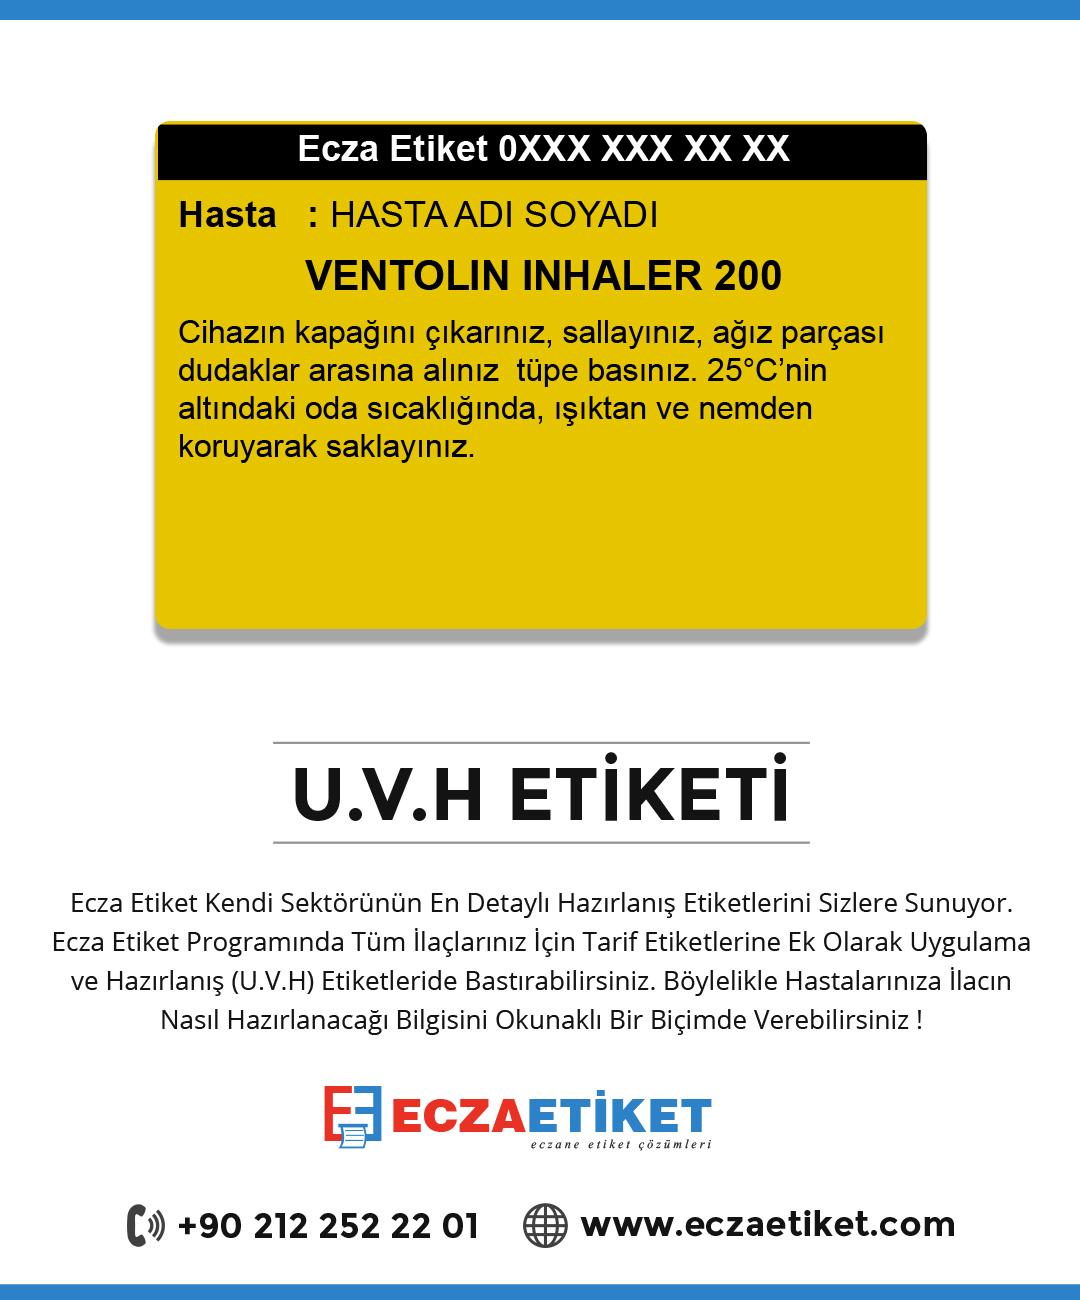 UVH-TARİF-ETİKET.jpg